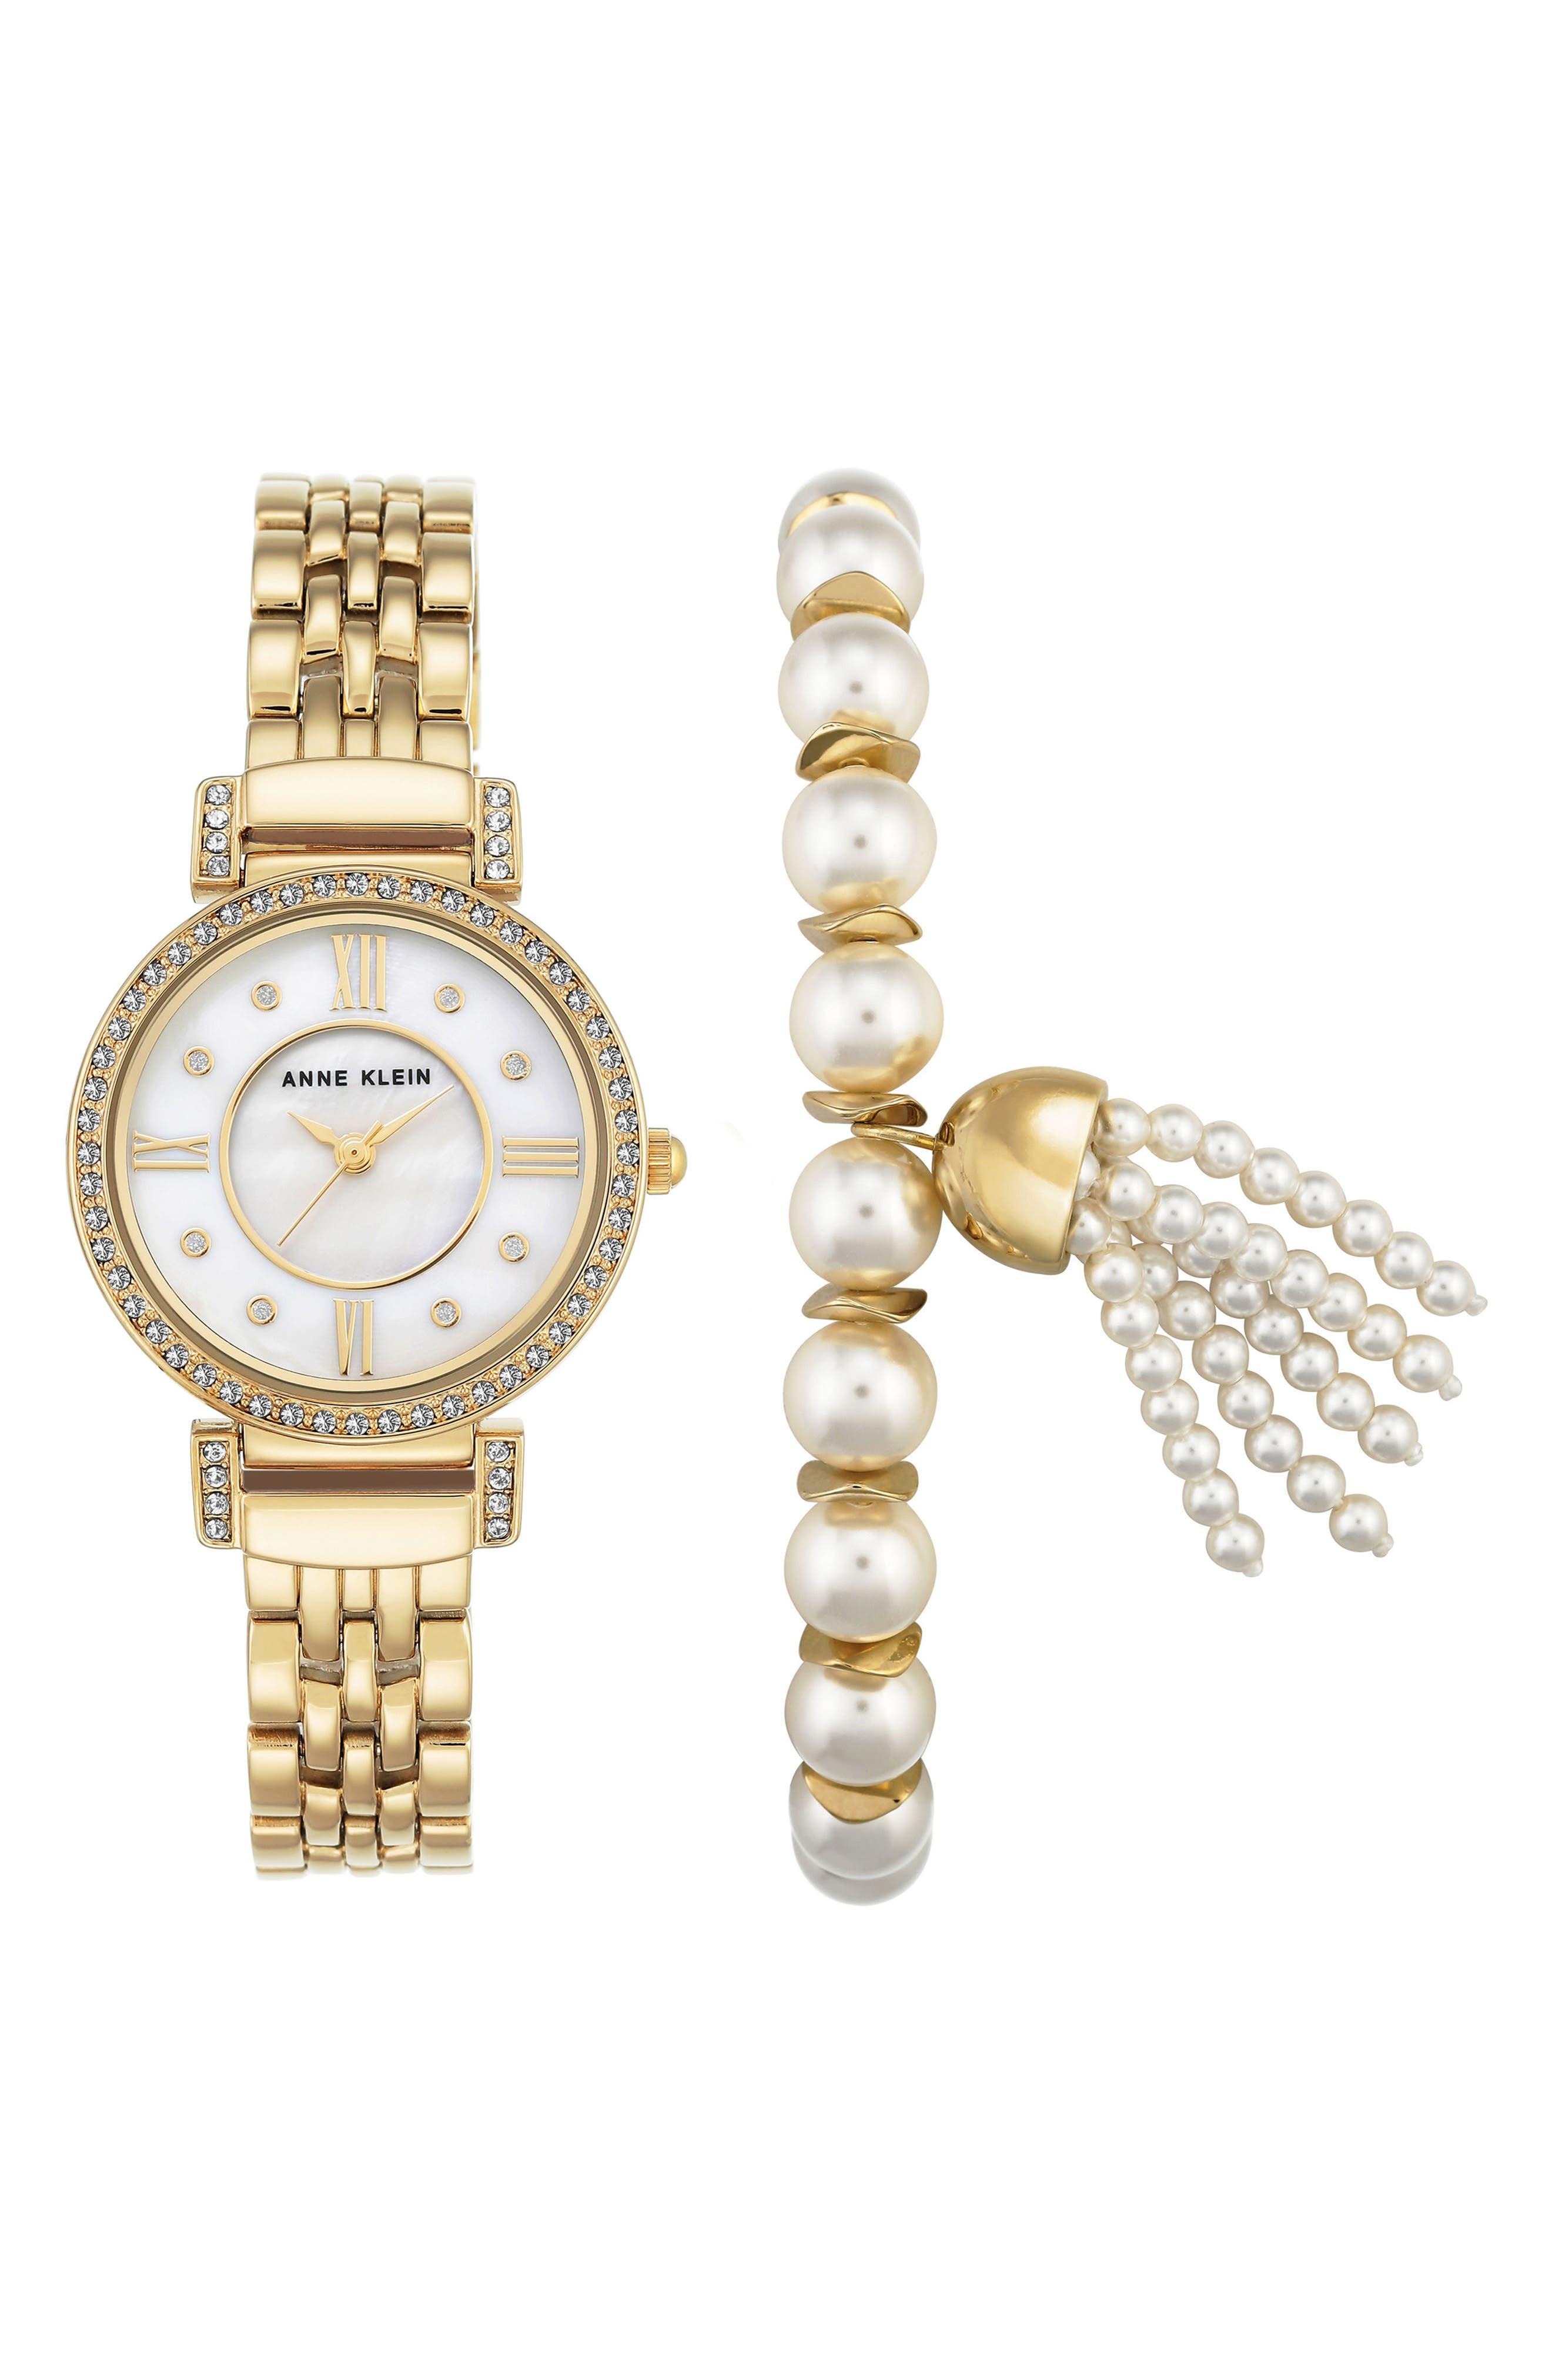 Main Image - Anne Klein Crystal Watch & Tassel Bracelet Set